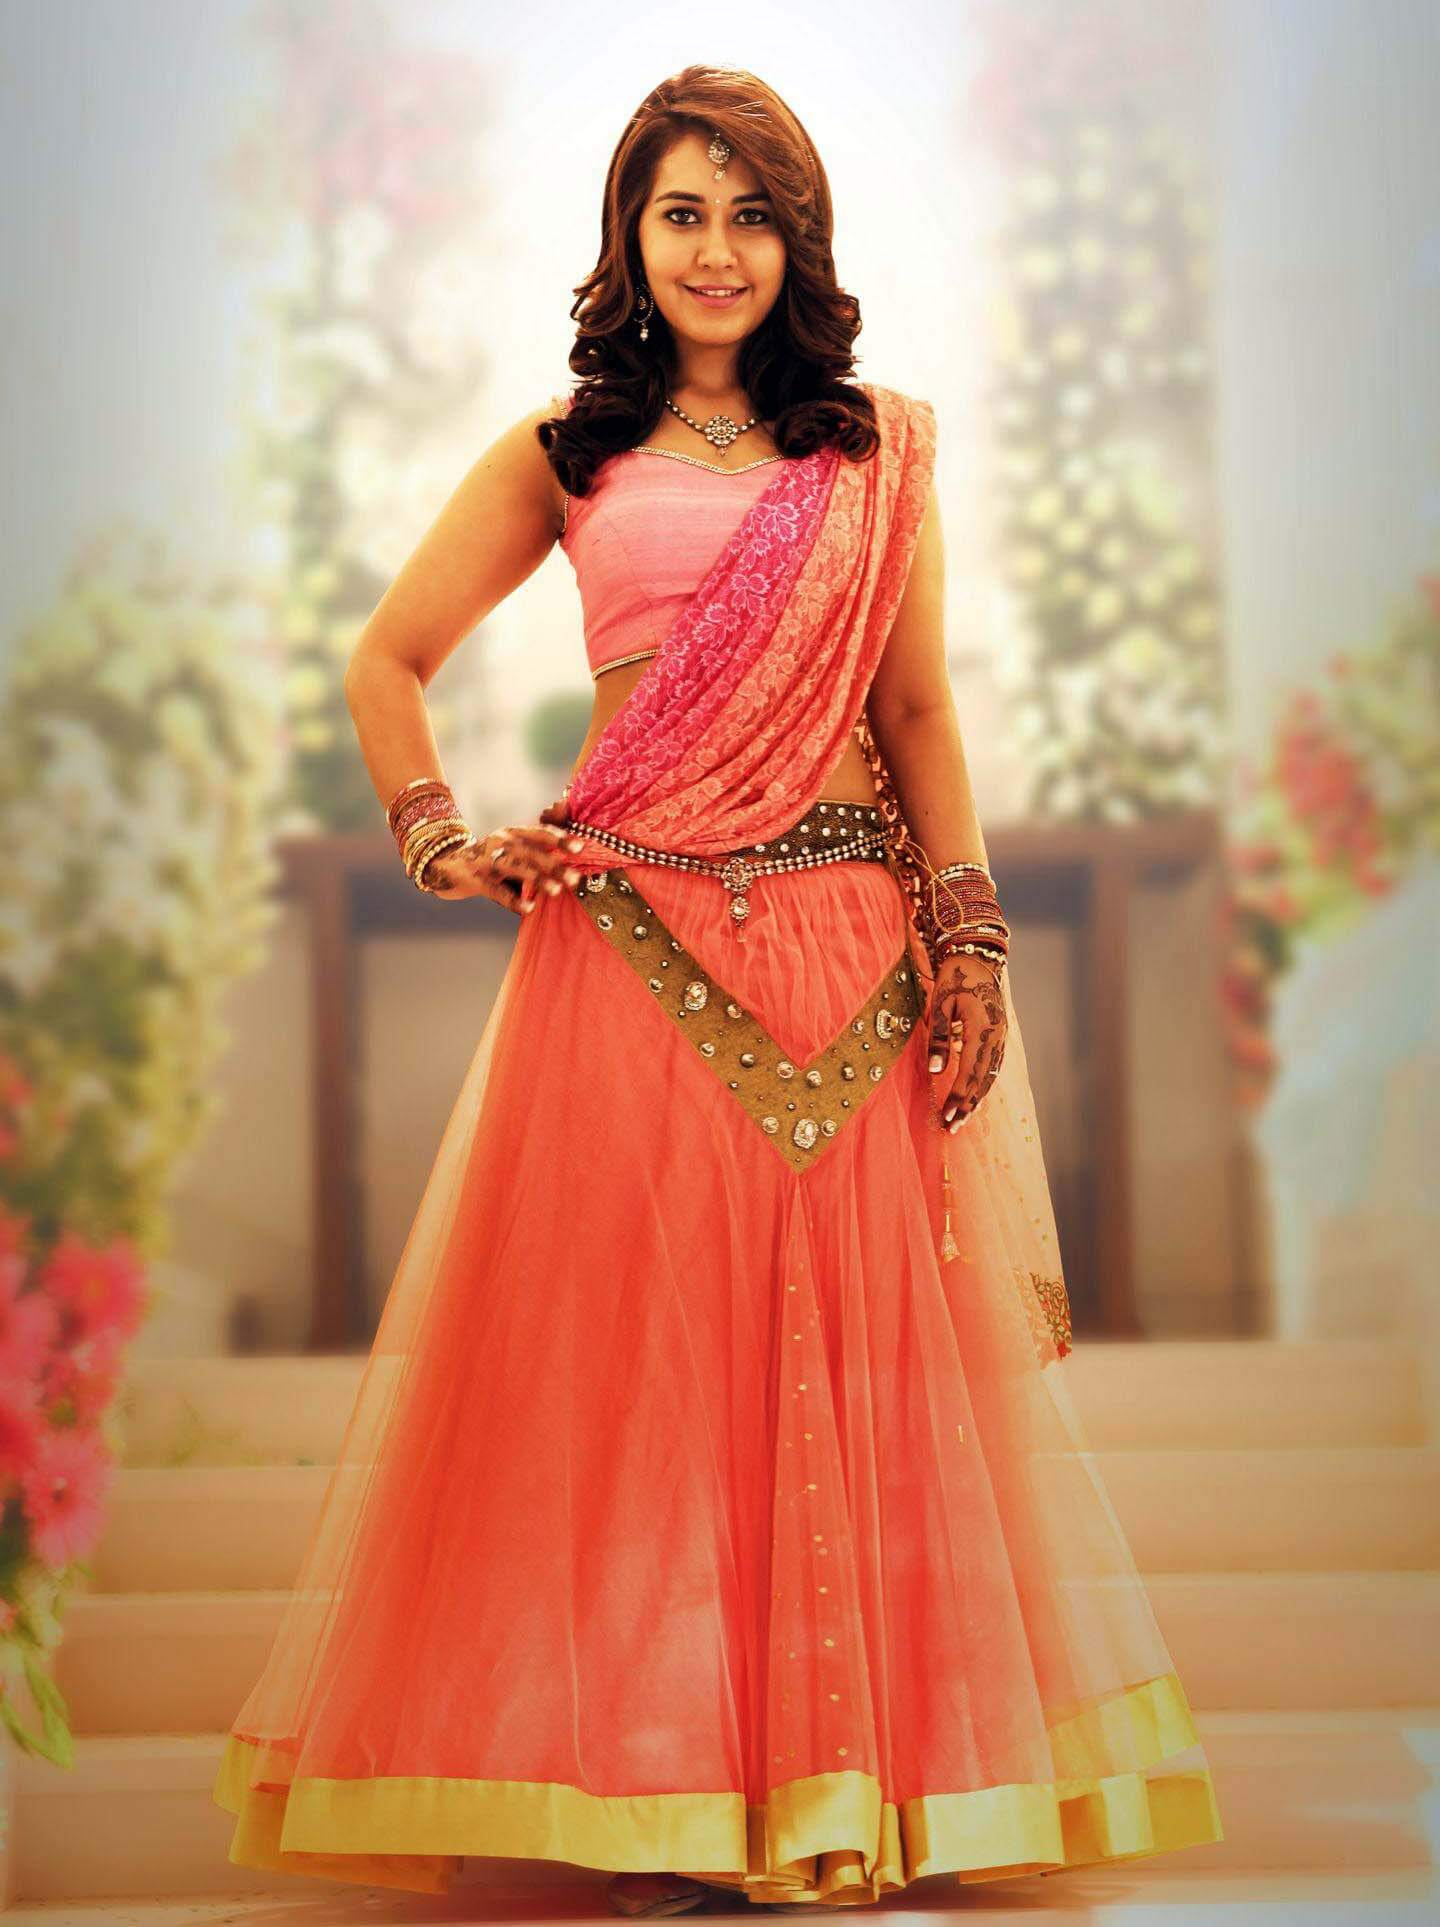 Indian Model Raashi Khanna